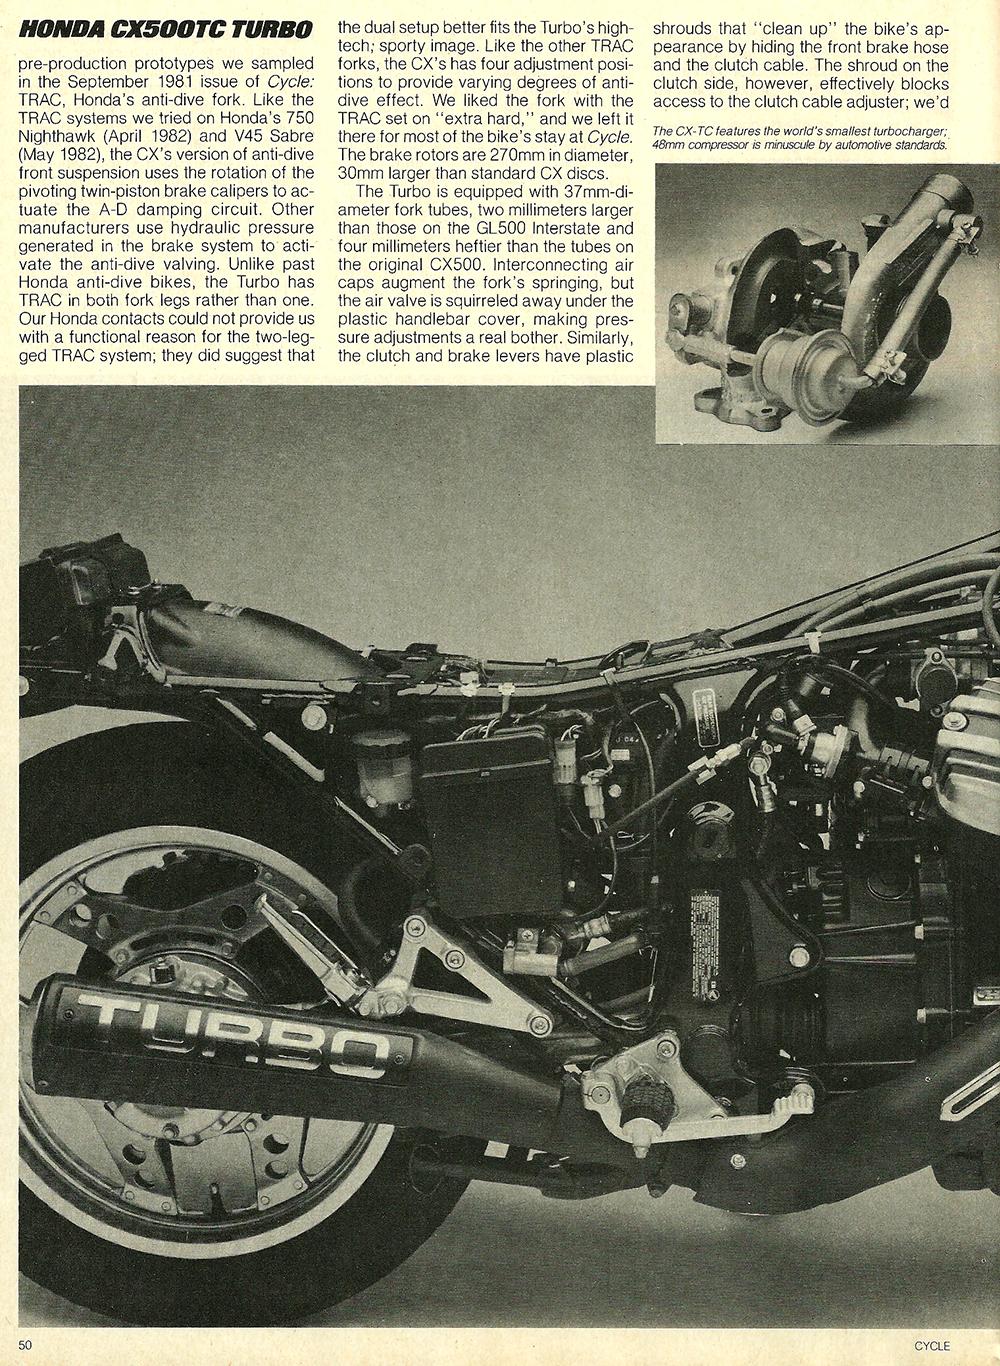 1982 Honda CX500TC Turbo road test 05.jpg